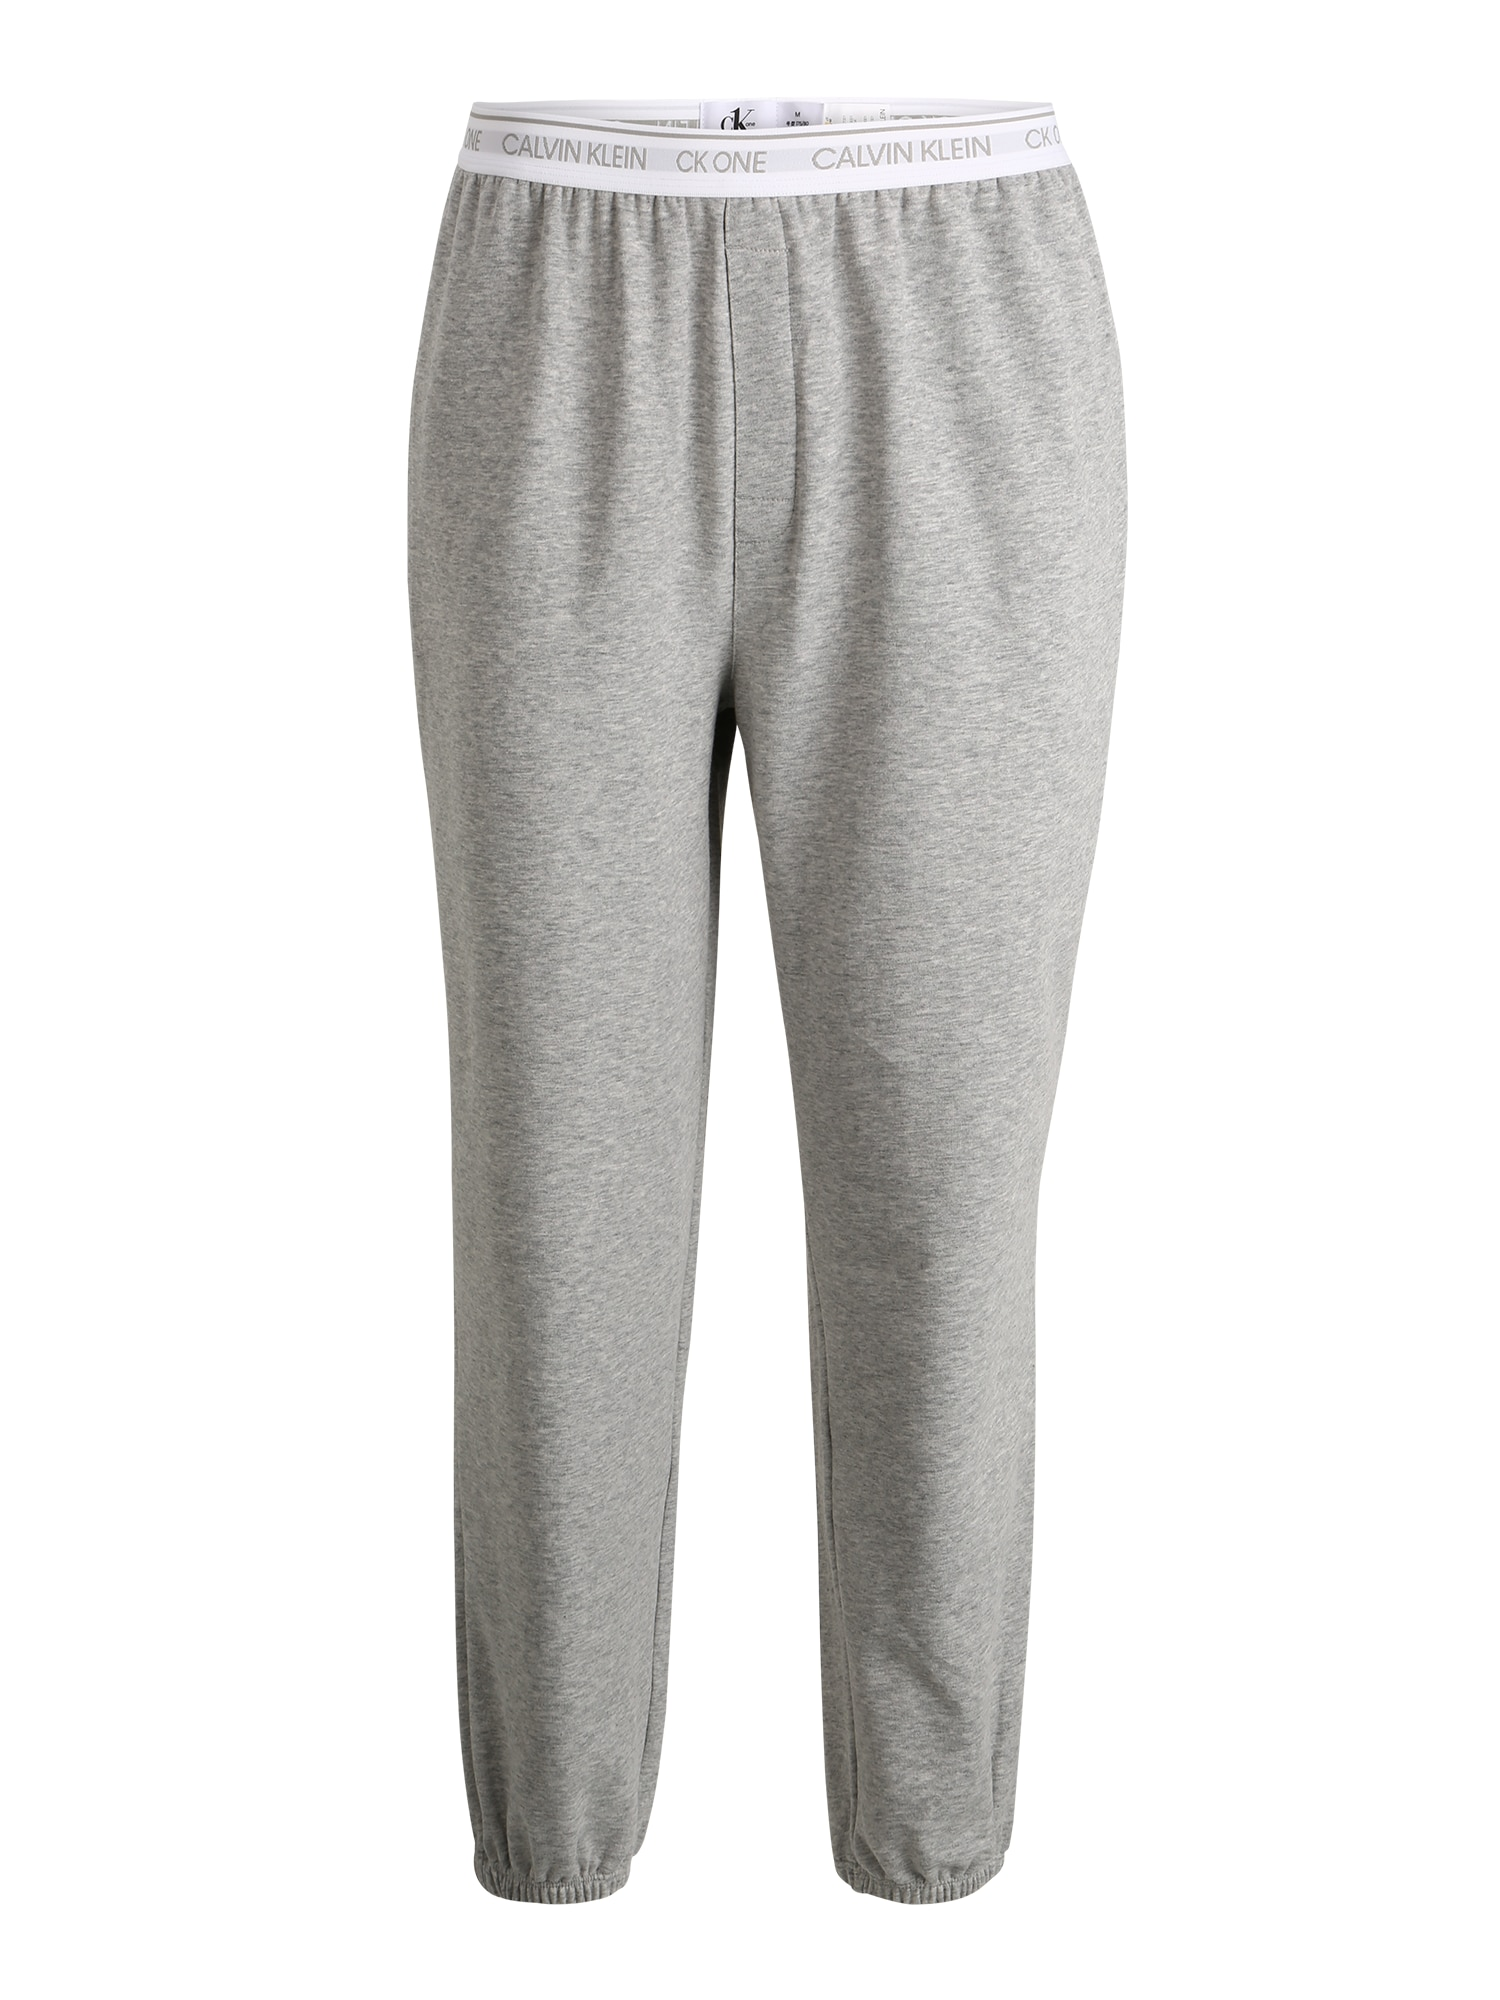 Calvin Klein Underwear Pižaminės kelnės pilka